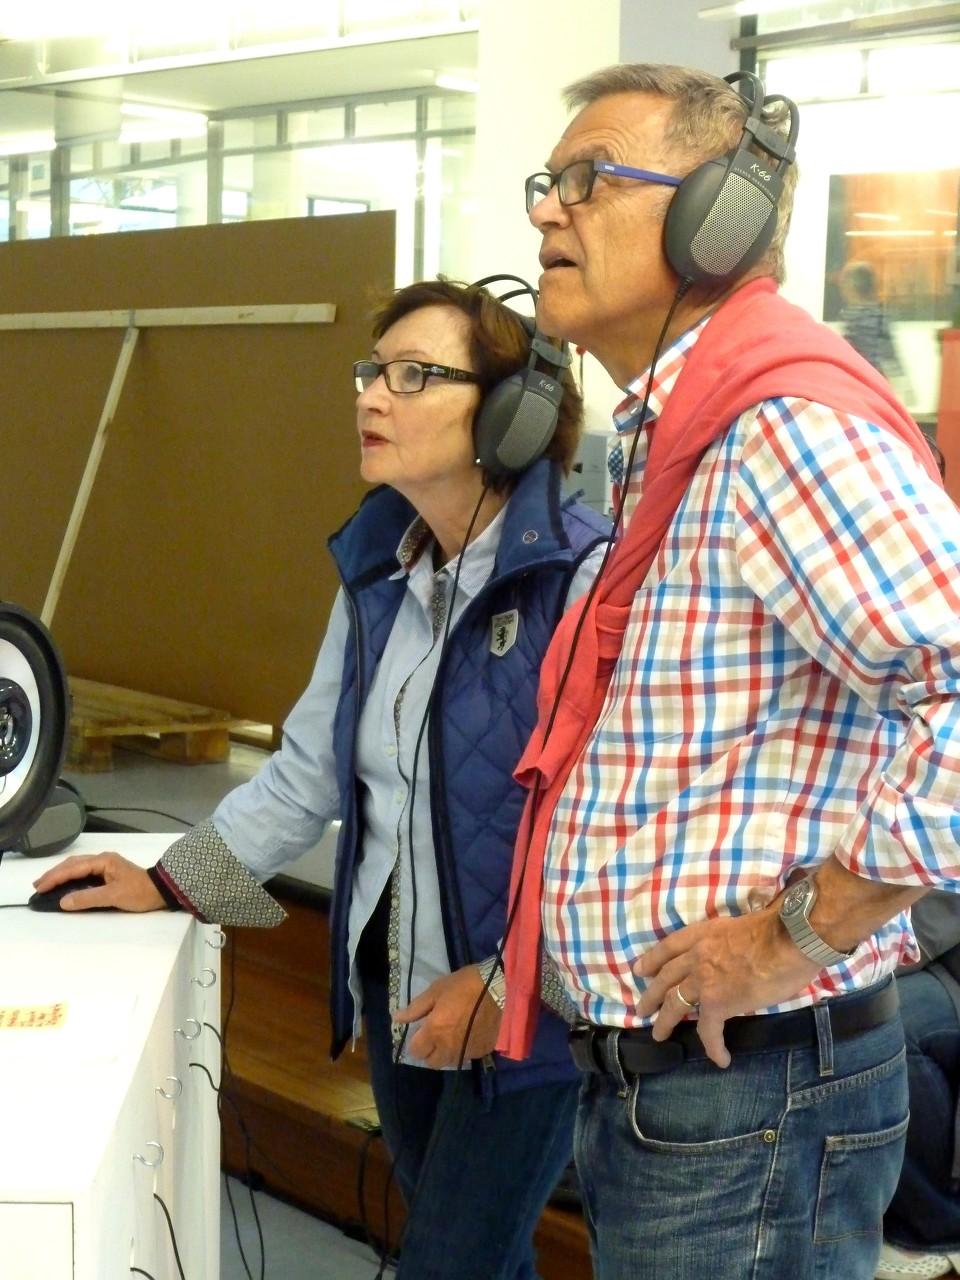 Stadtklang //: Hörorte - Besucher der Ausstellung an der Klangkarte